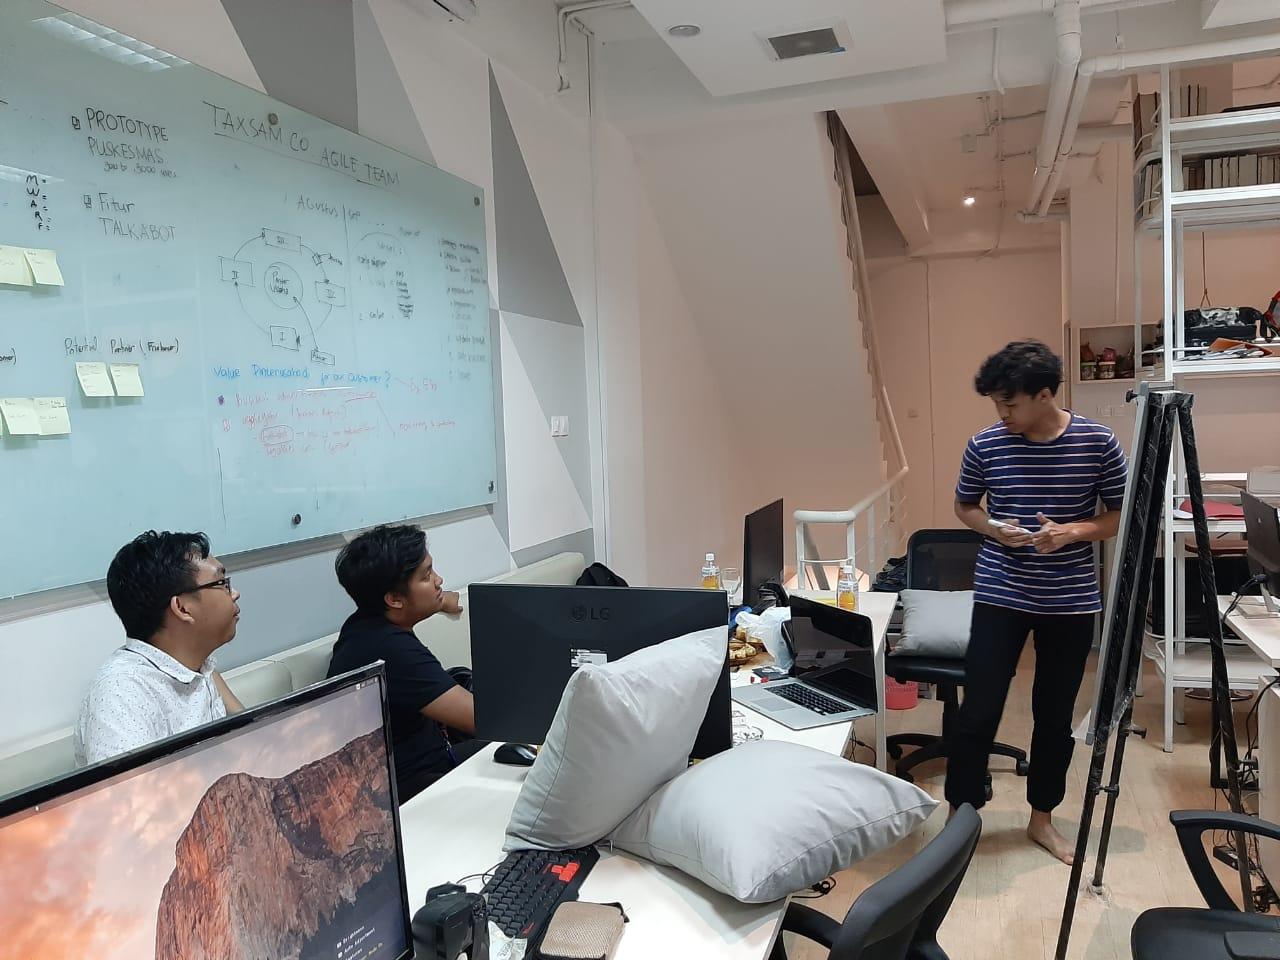 Kolaborasi Talkabot.ID x Pinterusaha.ai: Pengembangan platform bisnis terintegrasi untuk kemajuan UMKM Indonesia